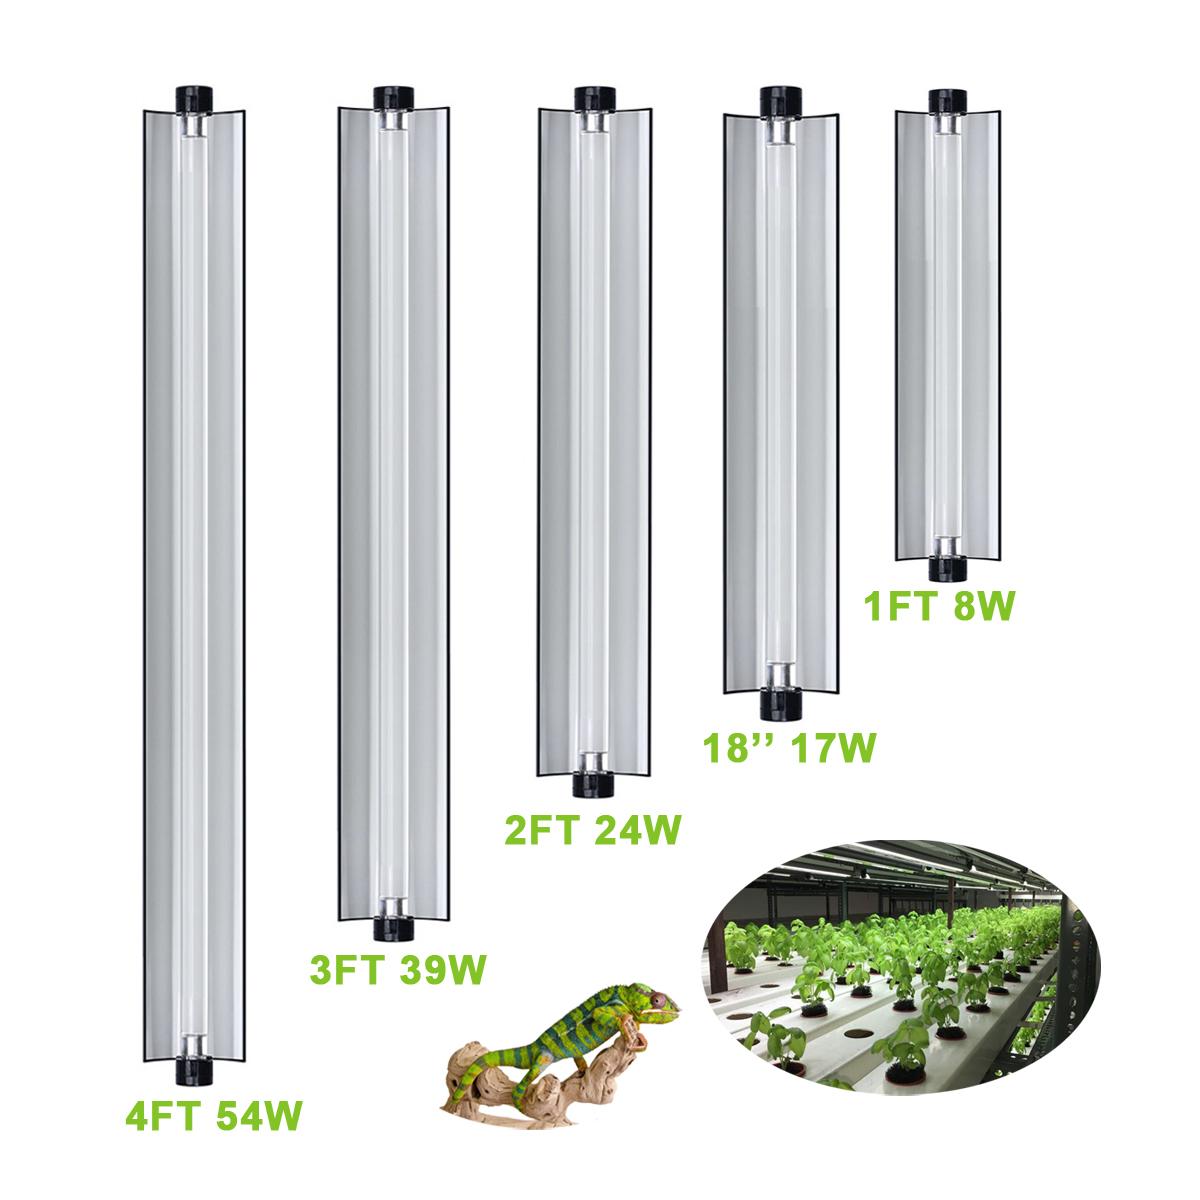 T5 Nanotech Reflector Combo 60cm 24 Inch Fluorescent Bulb 24w 6400k Plants Lighting Fixture Habitat Hanging